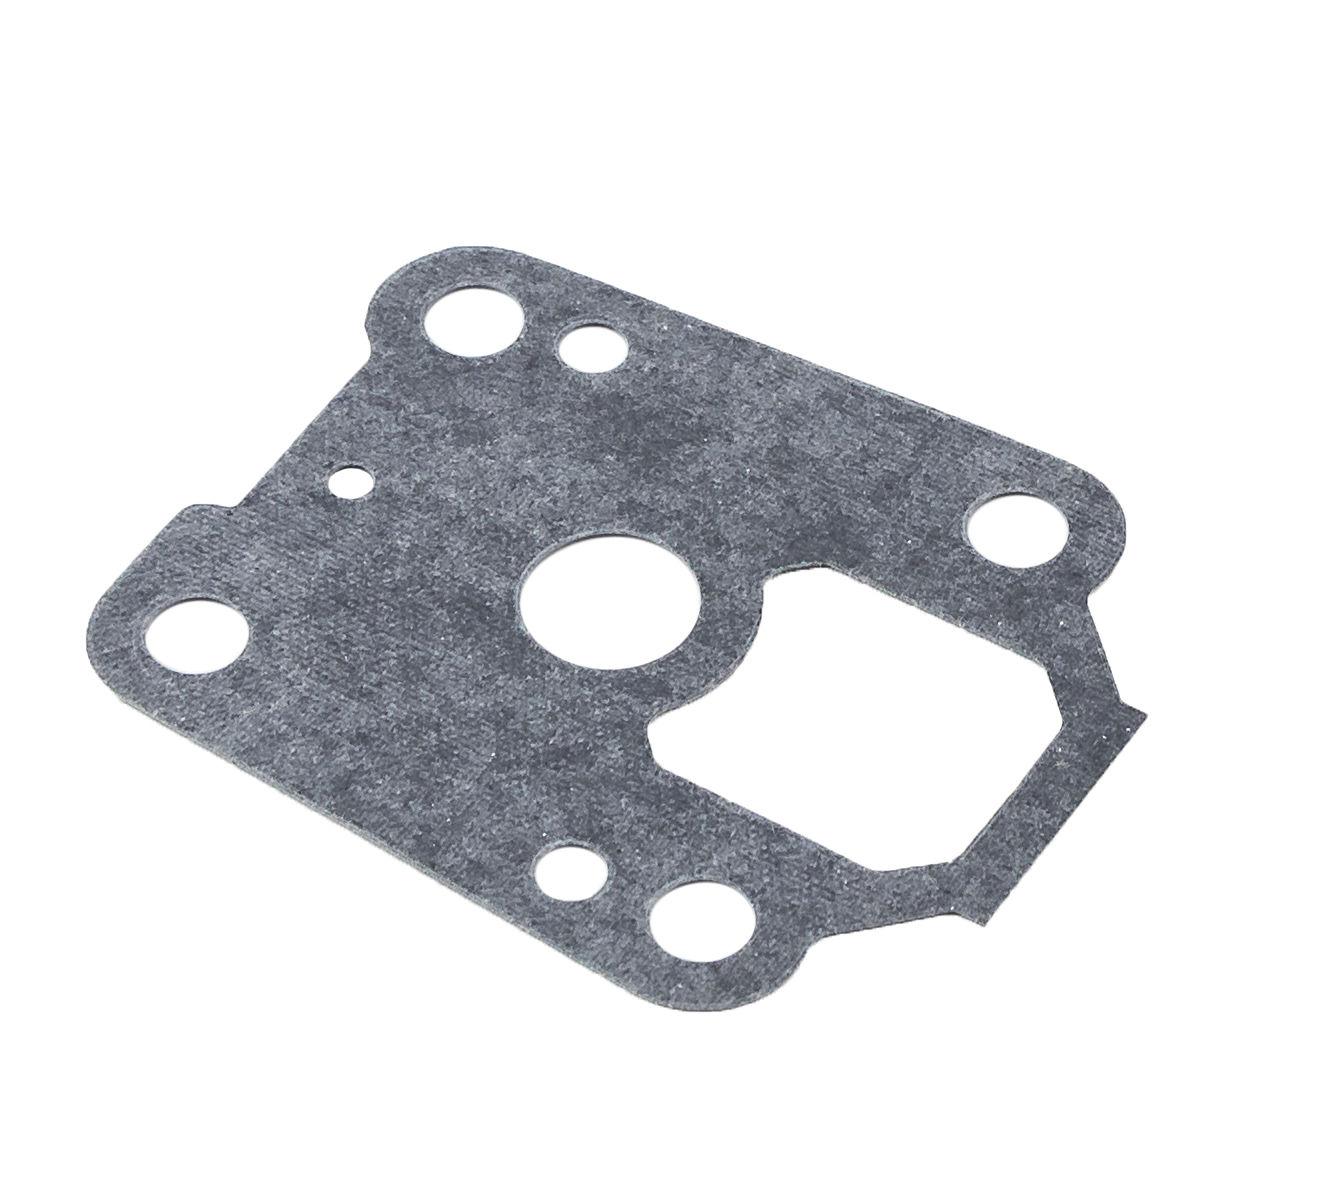 Gasket Plate Pump Tohatsu M4/5, MFS4-6 369650290